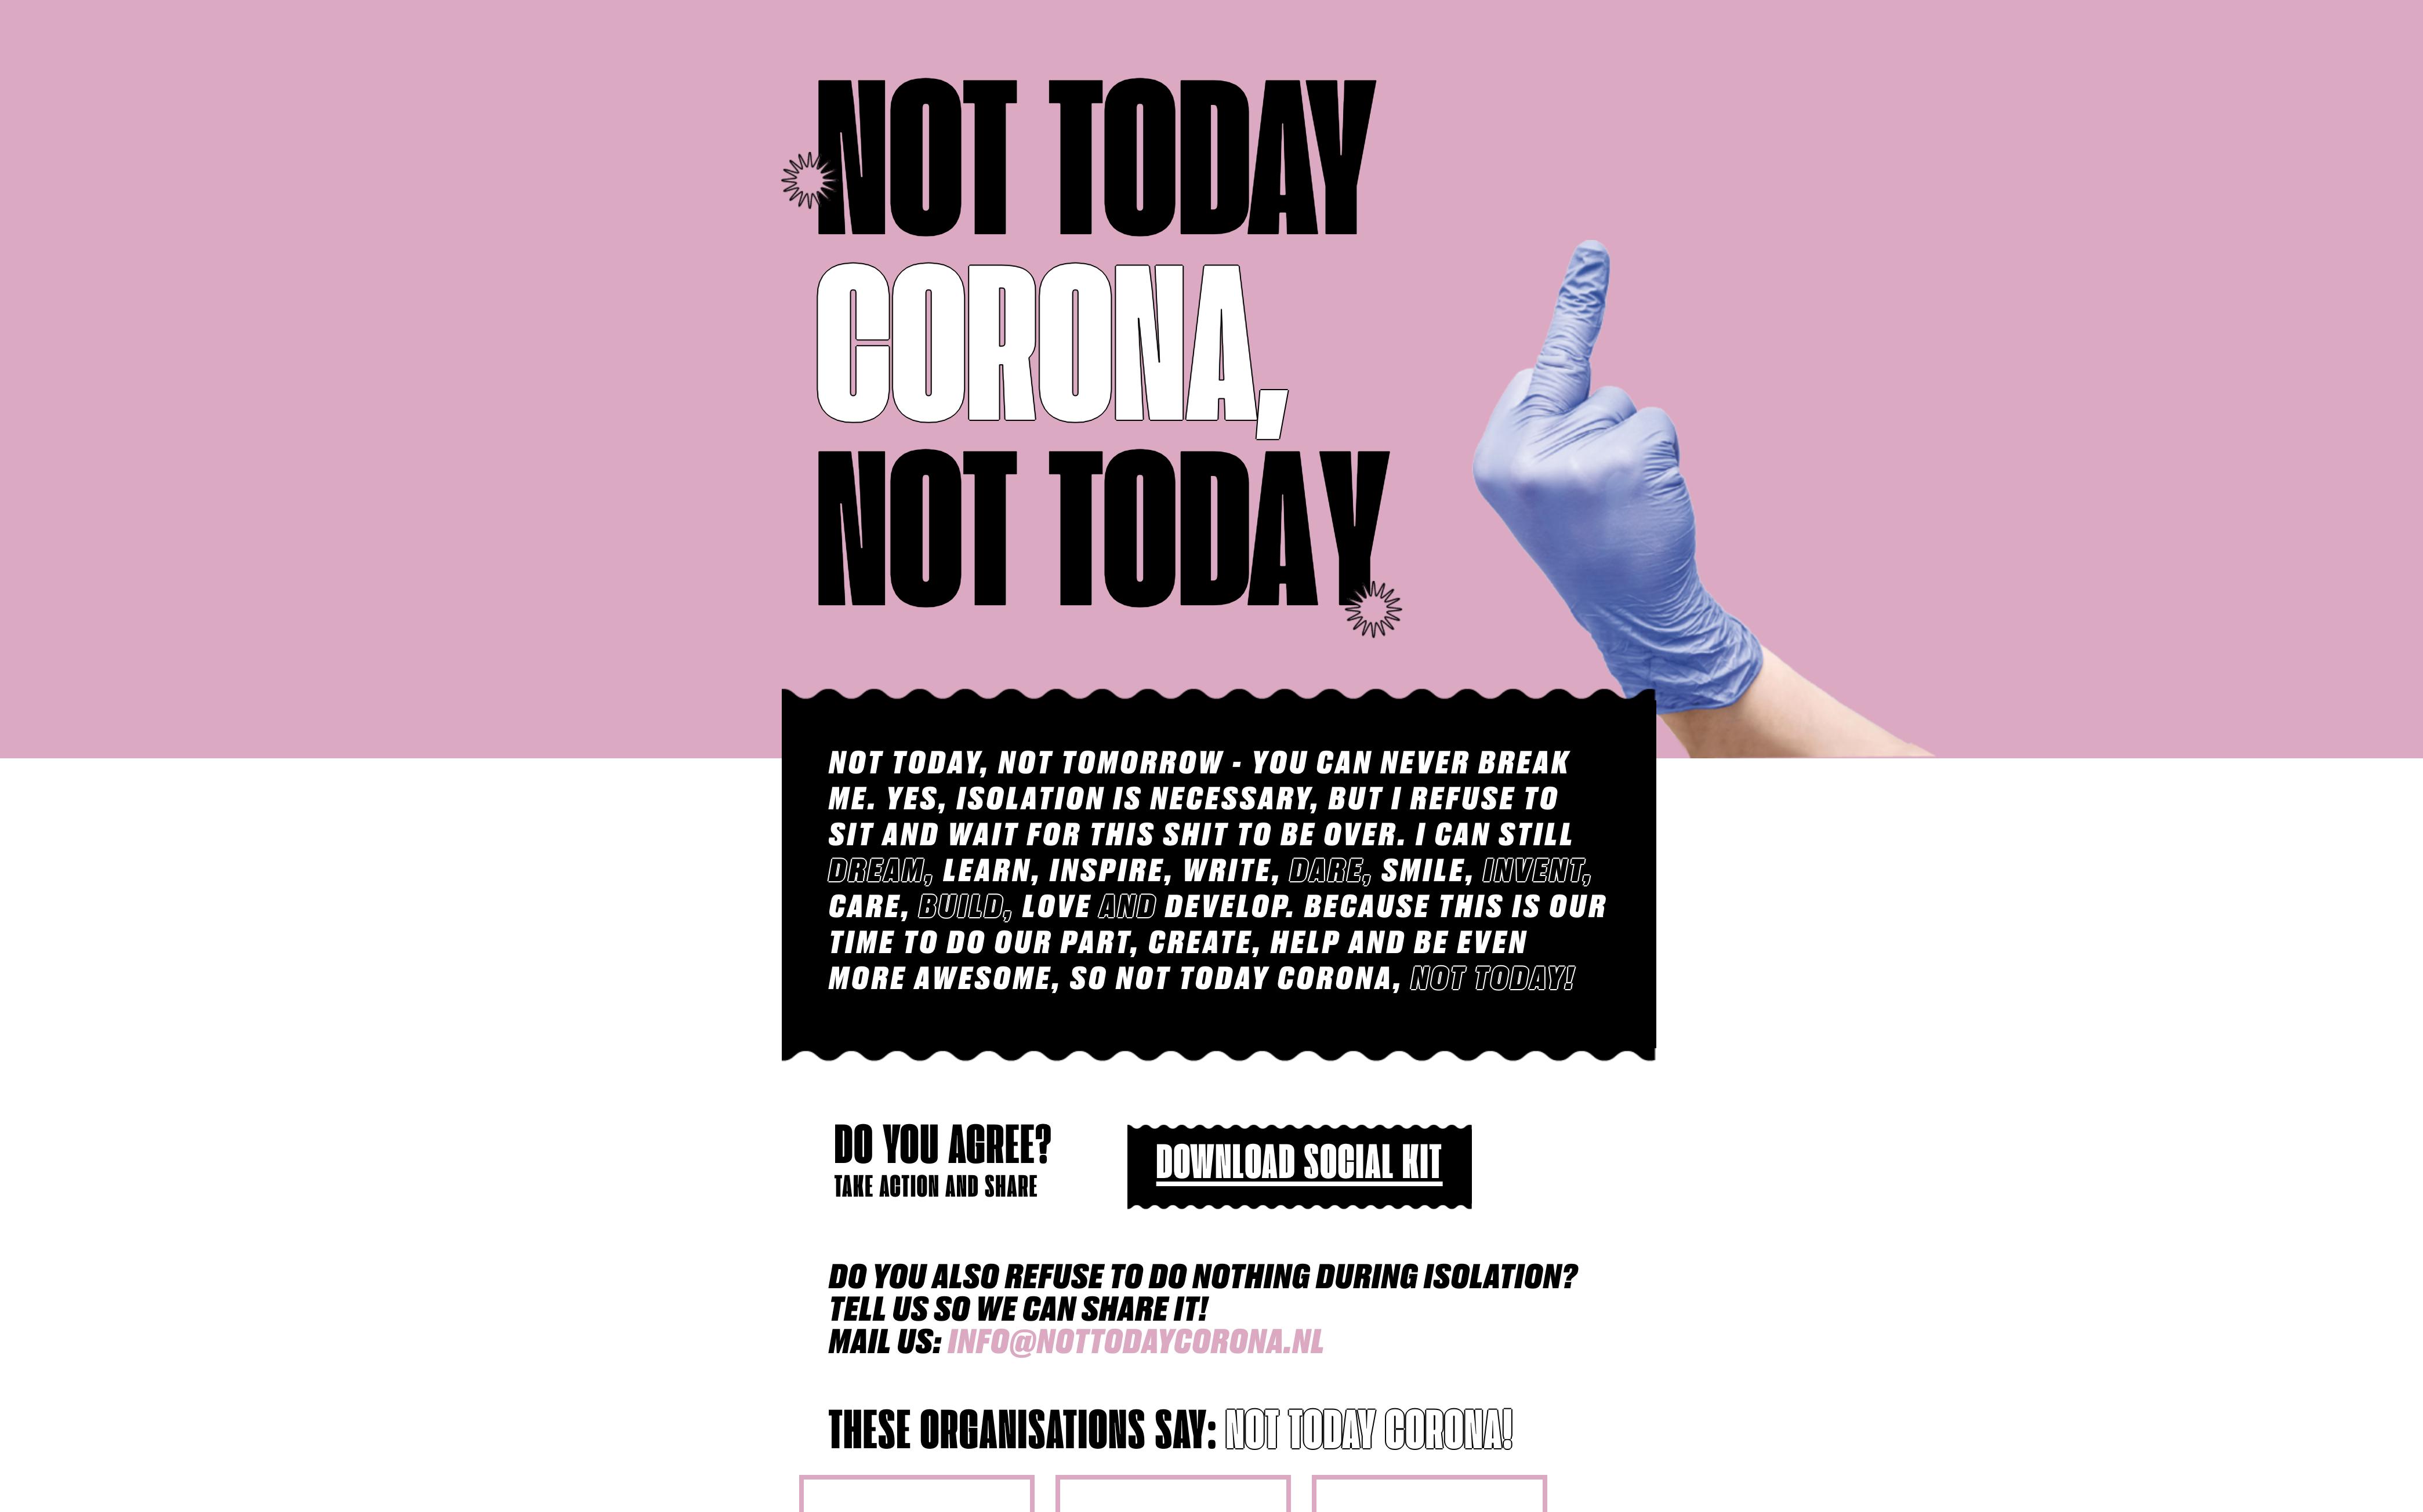 Not today, Corona